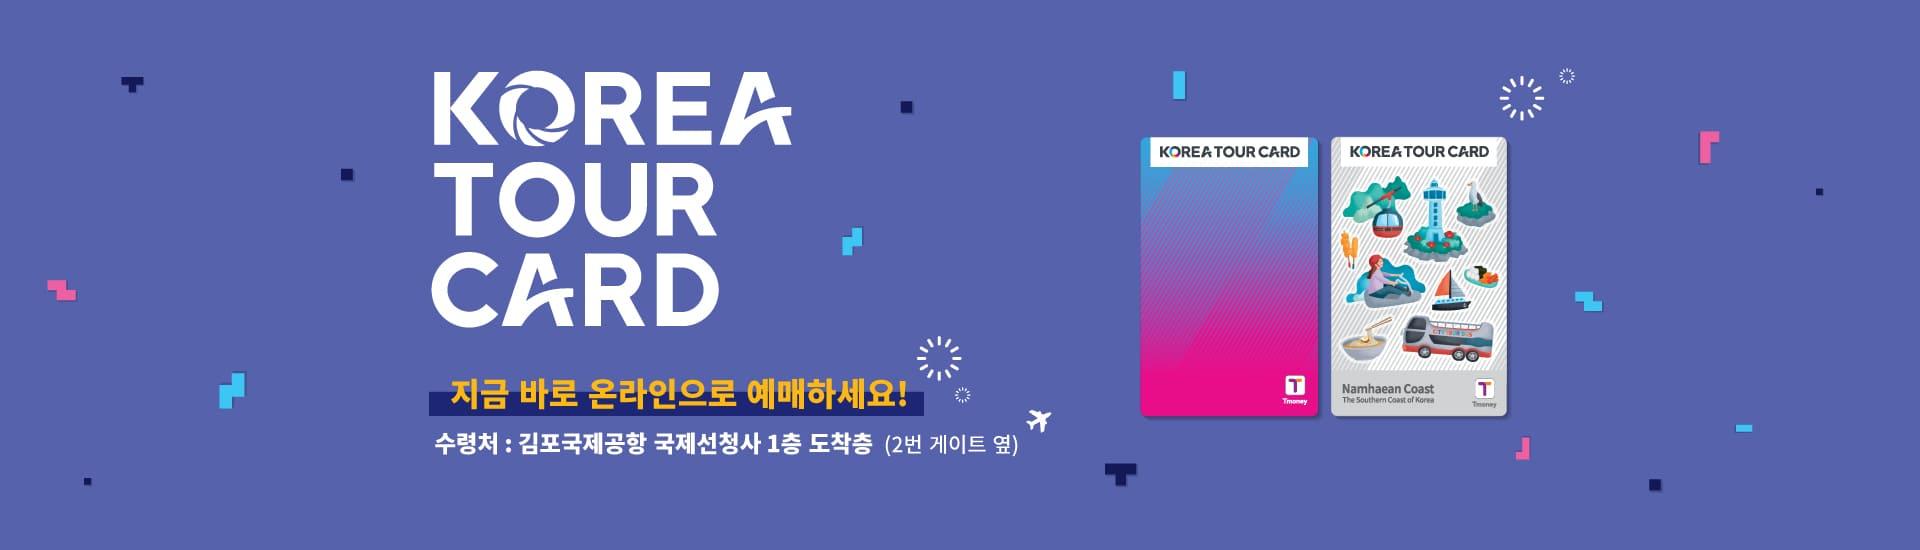 Korea_Tour_Card_Main_KO_ver_1920*550